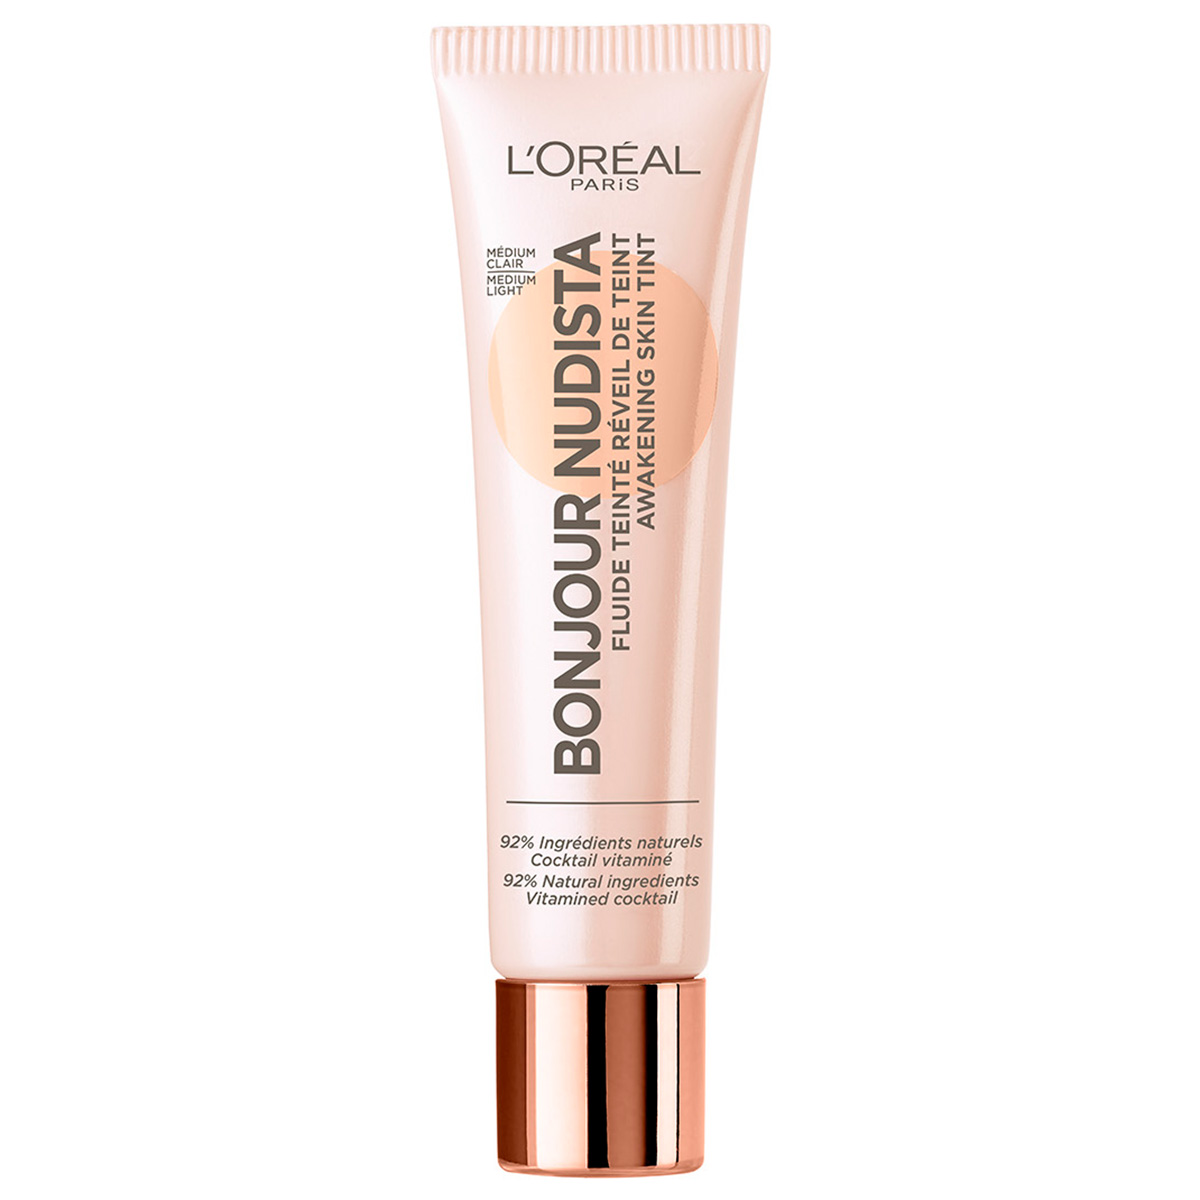 LOréal Paris Bonjour Nudista BB Cream - 30 ml